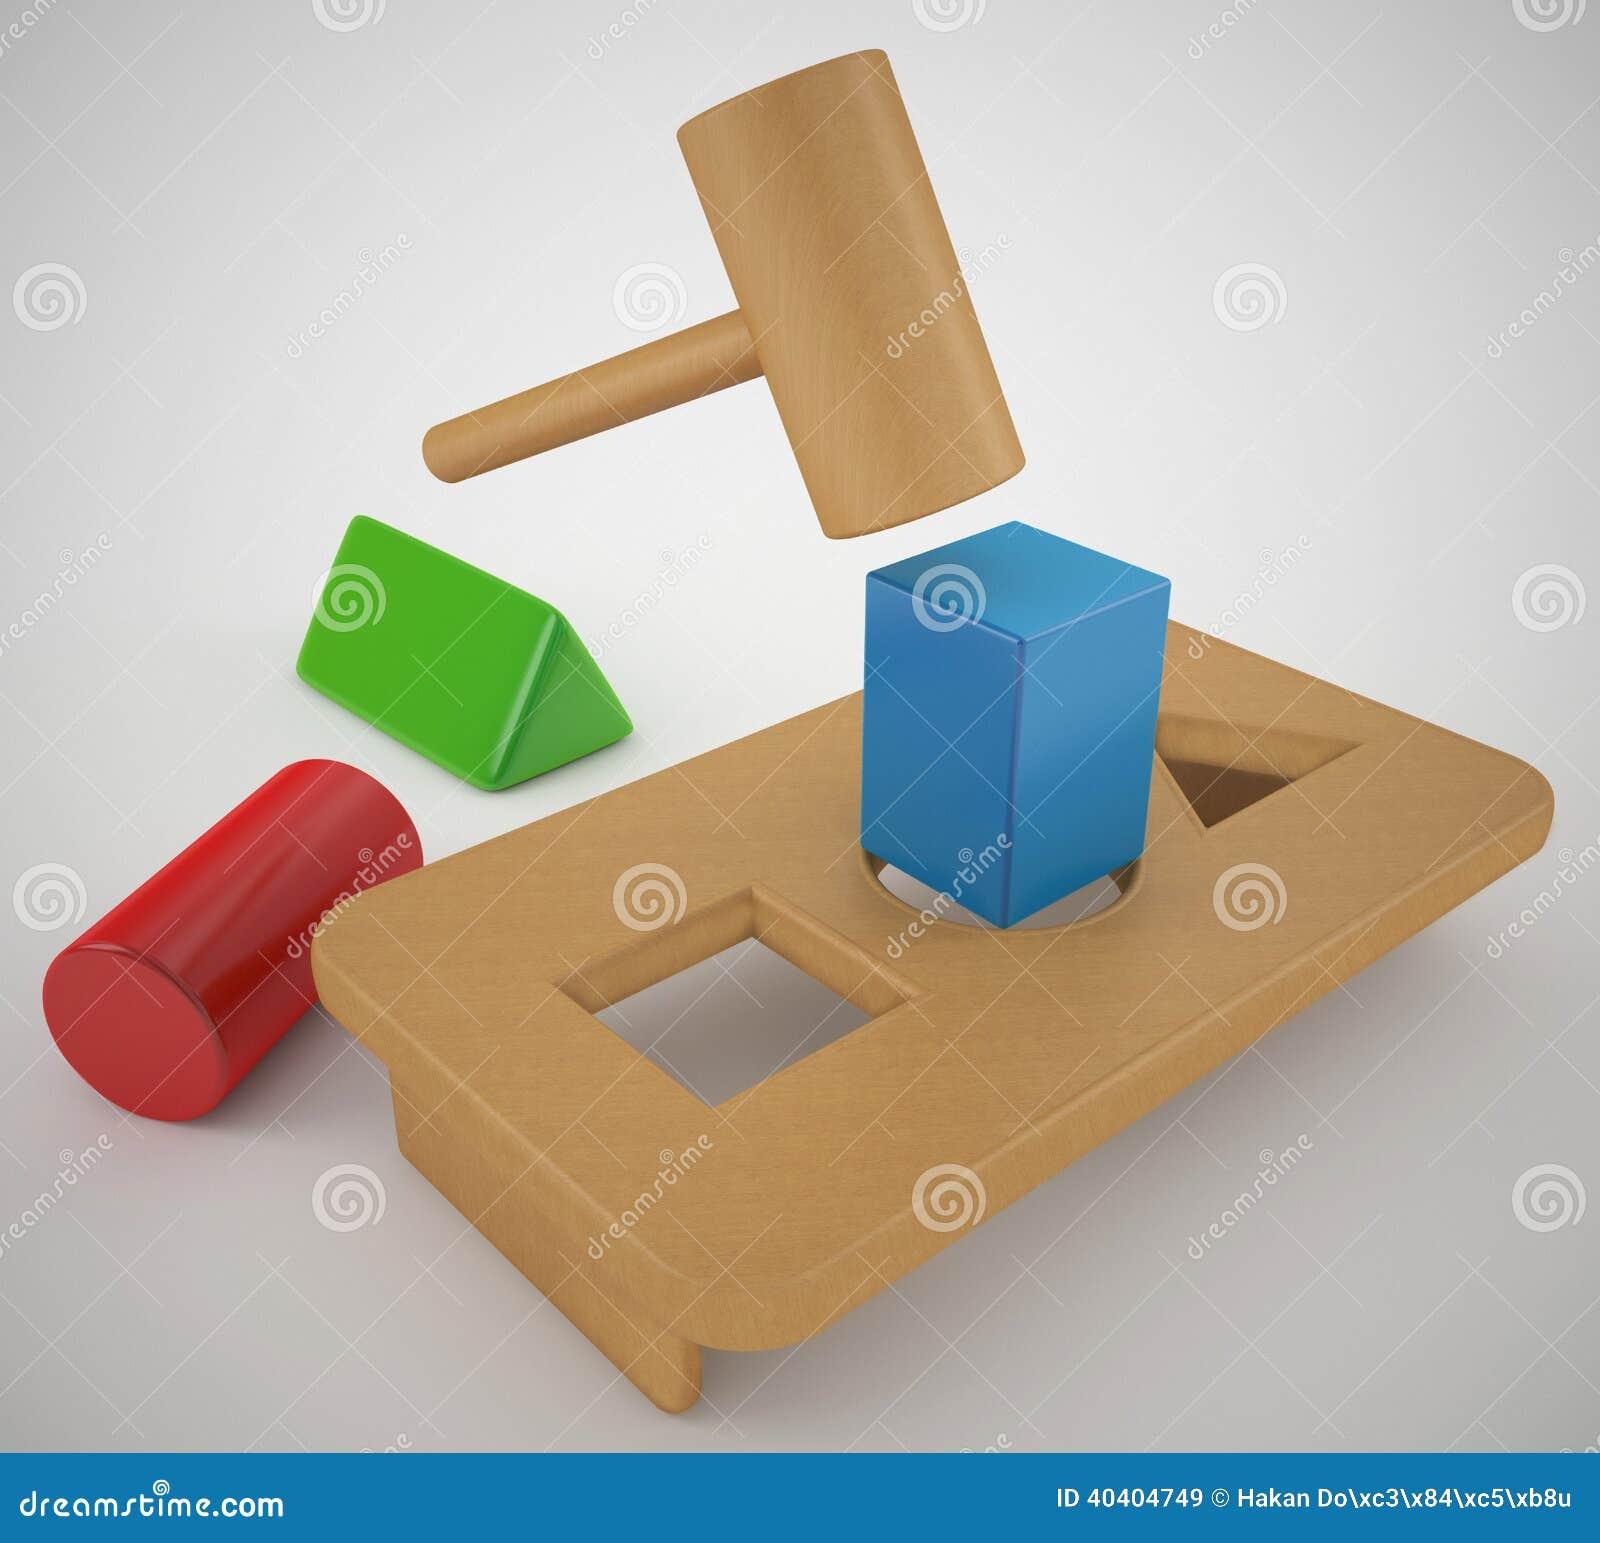 trou rond de cheville carr e illustration stock illustration du rendu table 40404749. Black Bedroom Furniture Sets. Home Design Ideas